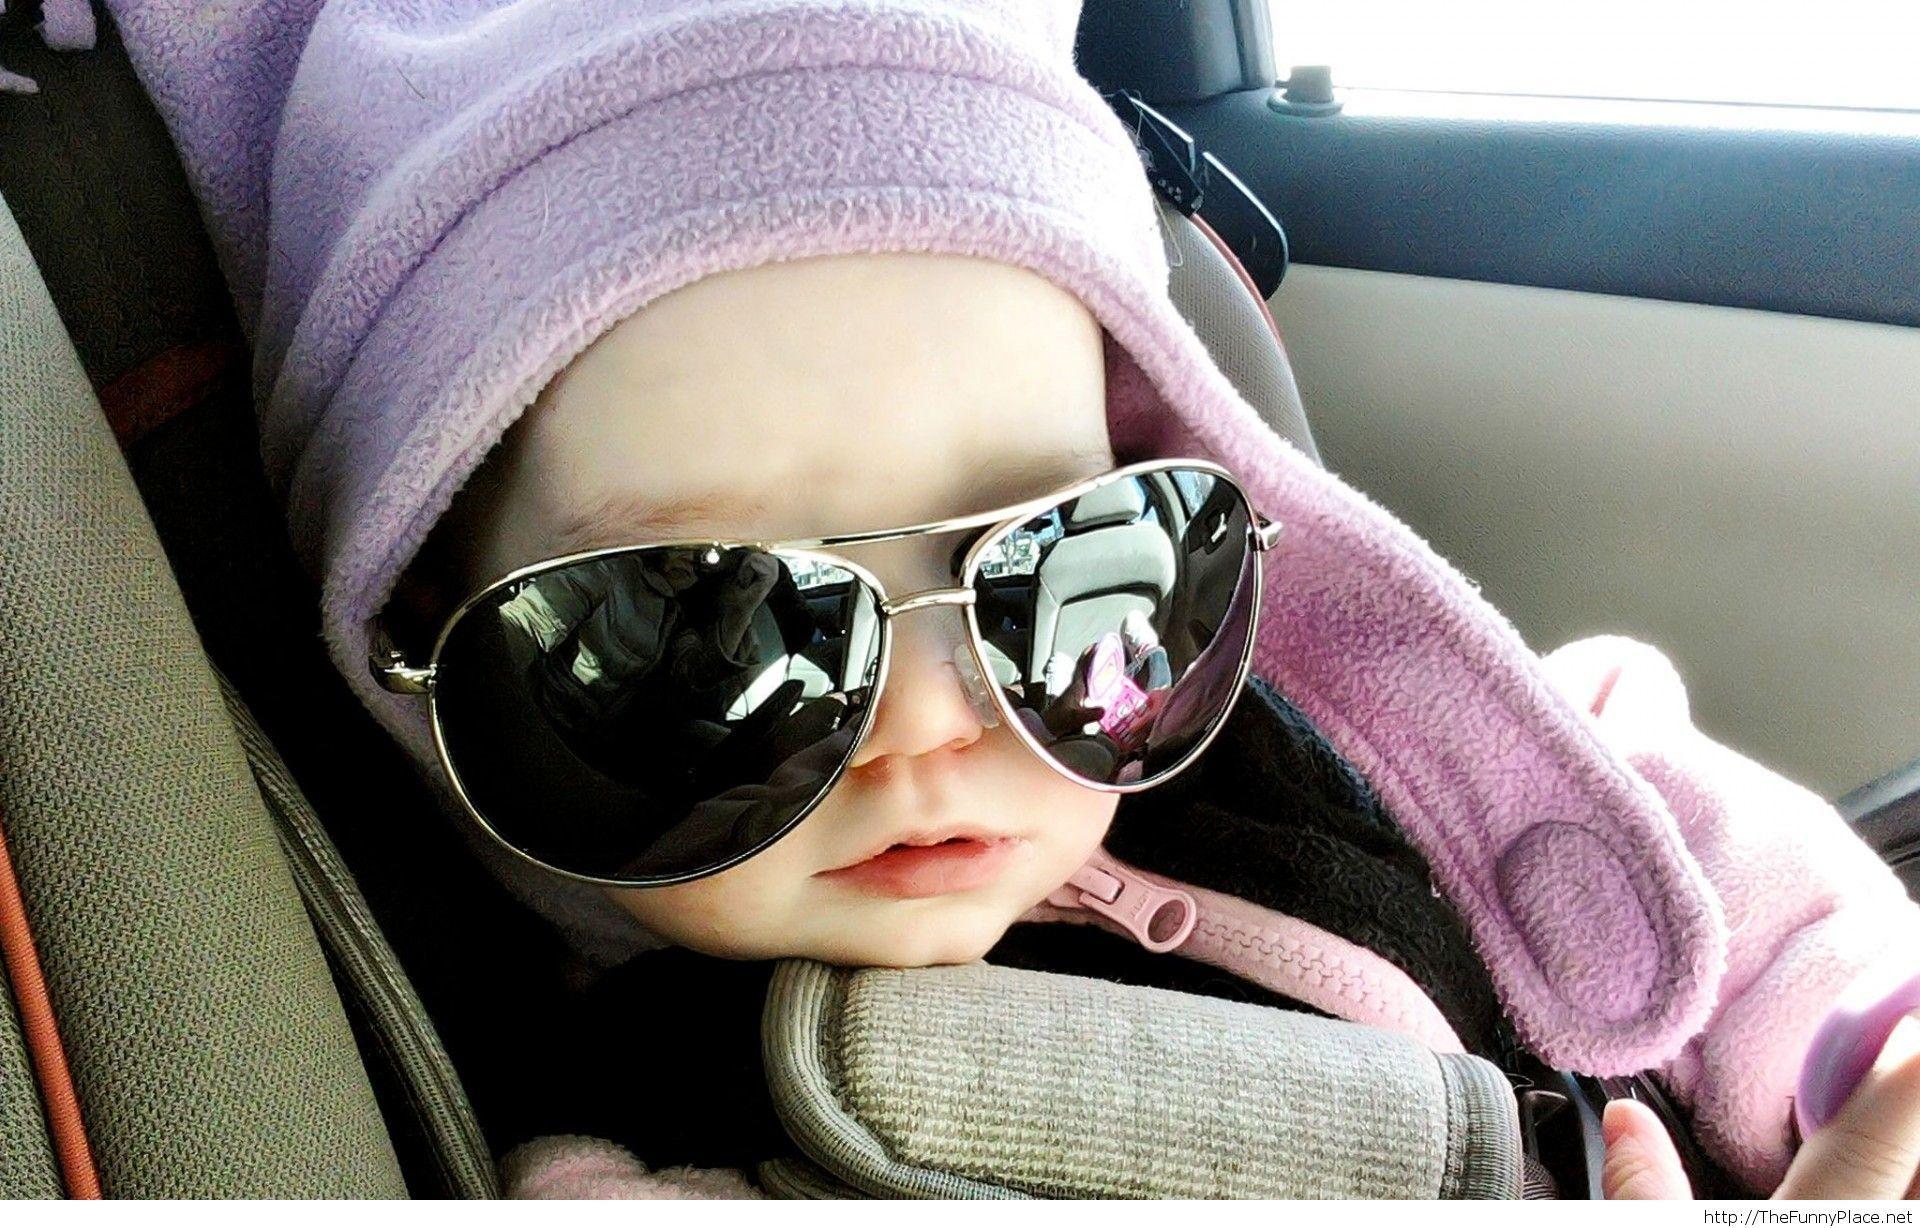 Awesome baby image